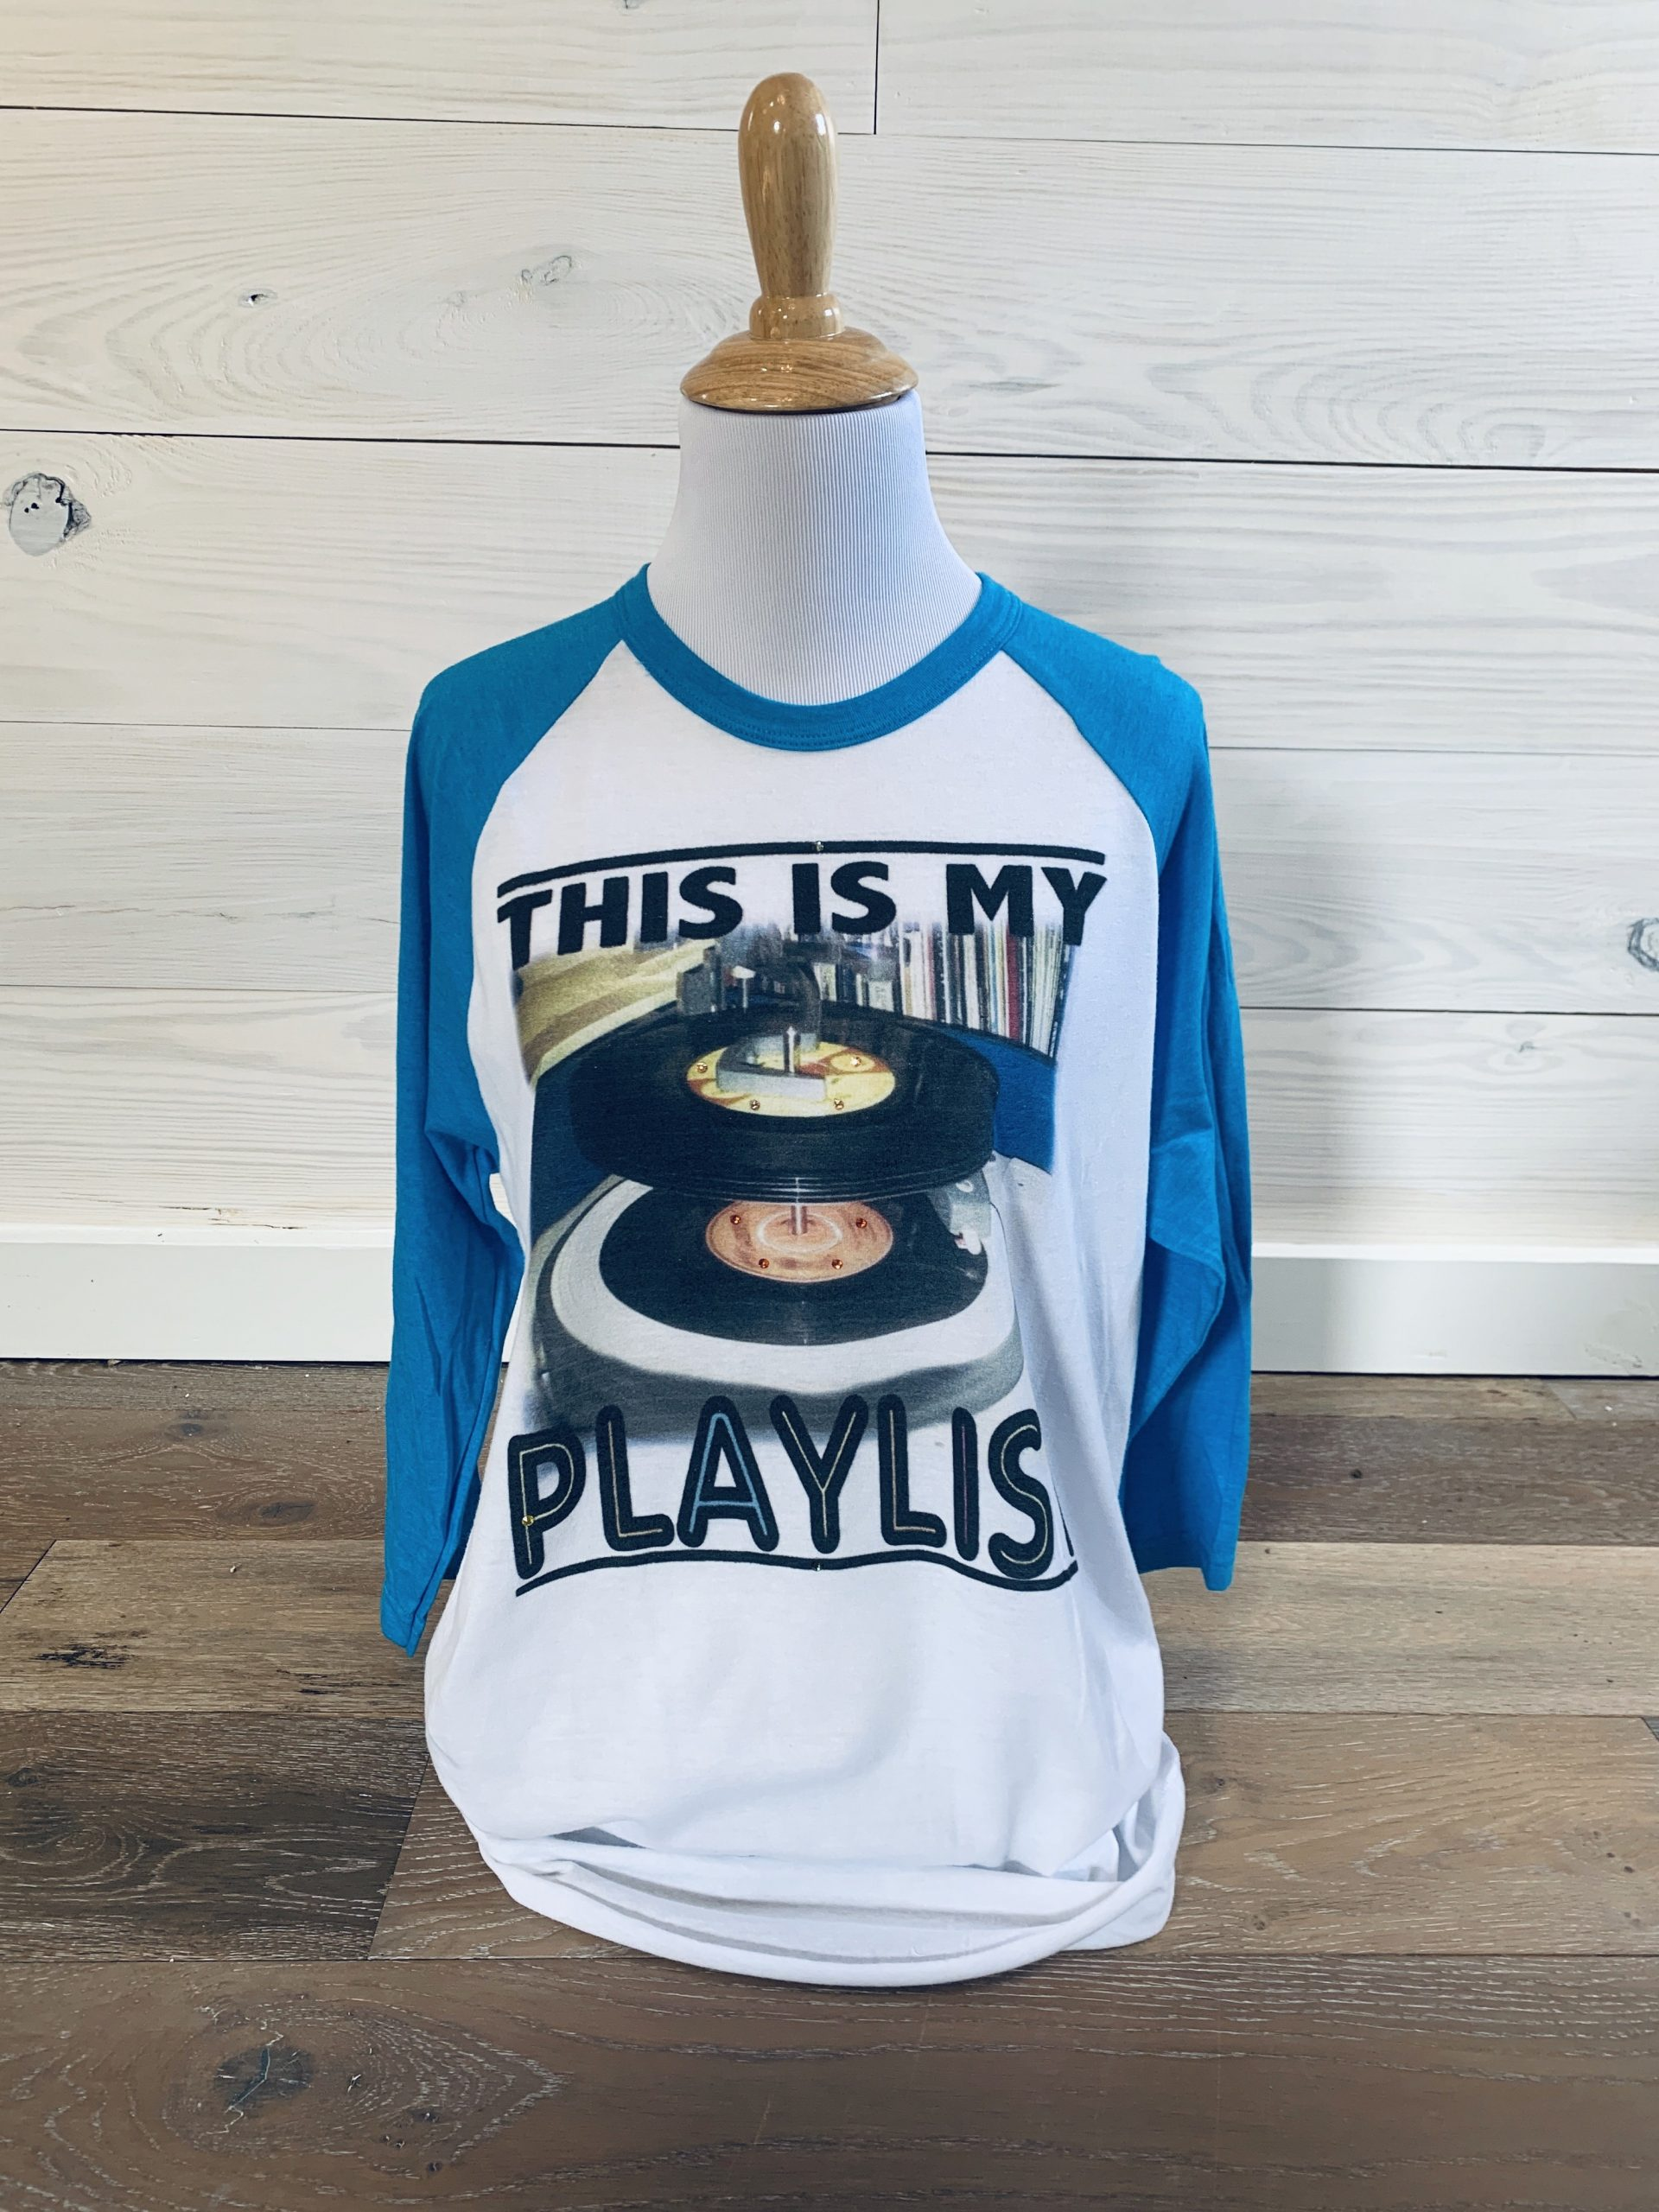 This is My Playlist on Blue Baseball Tee